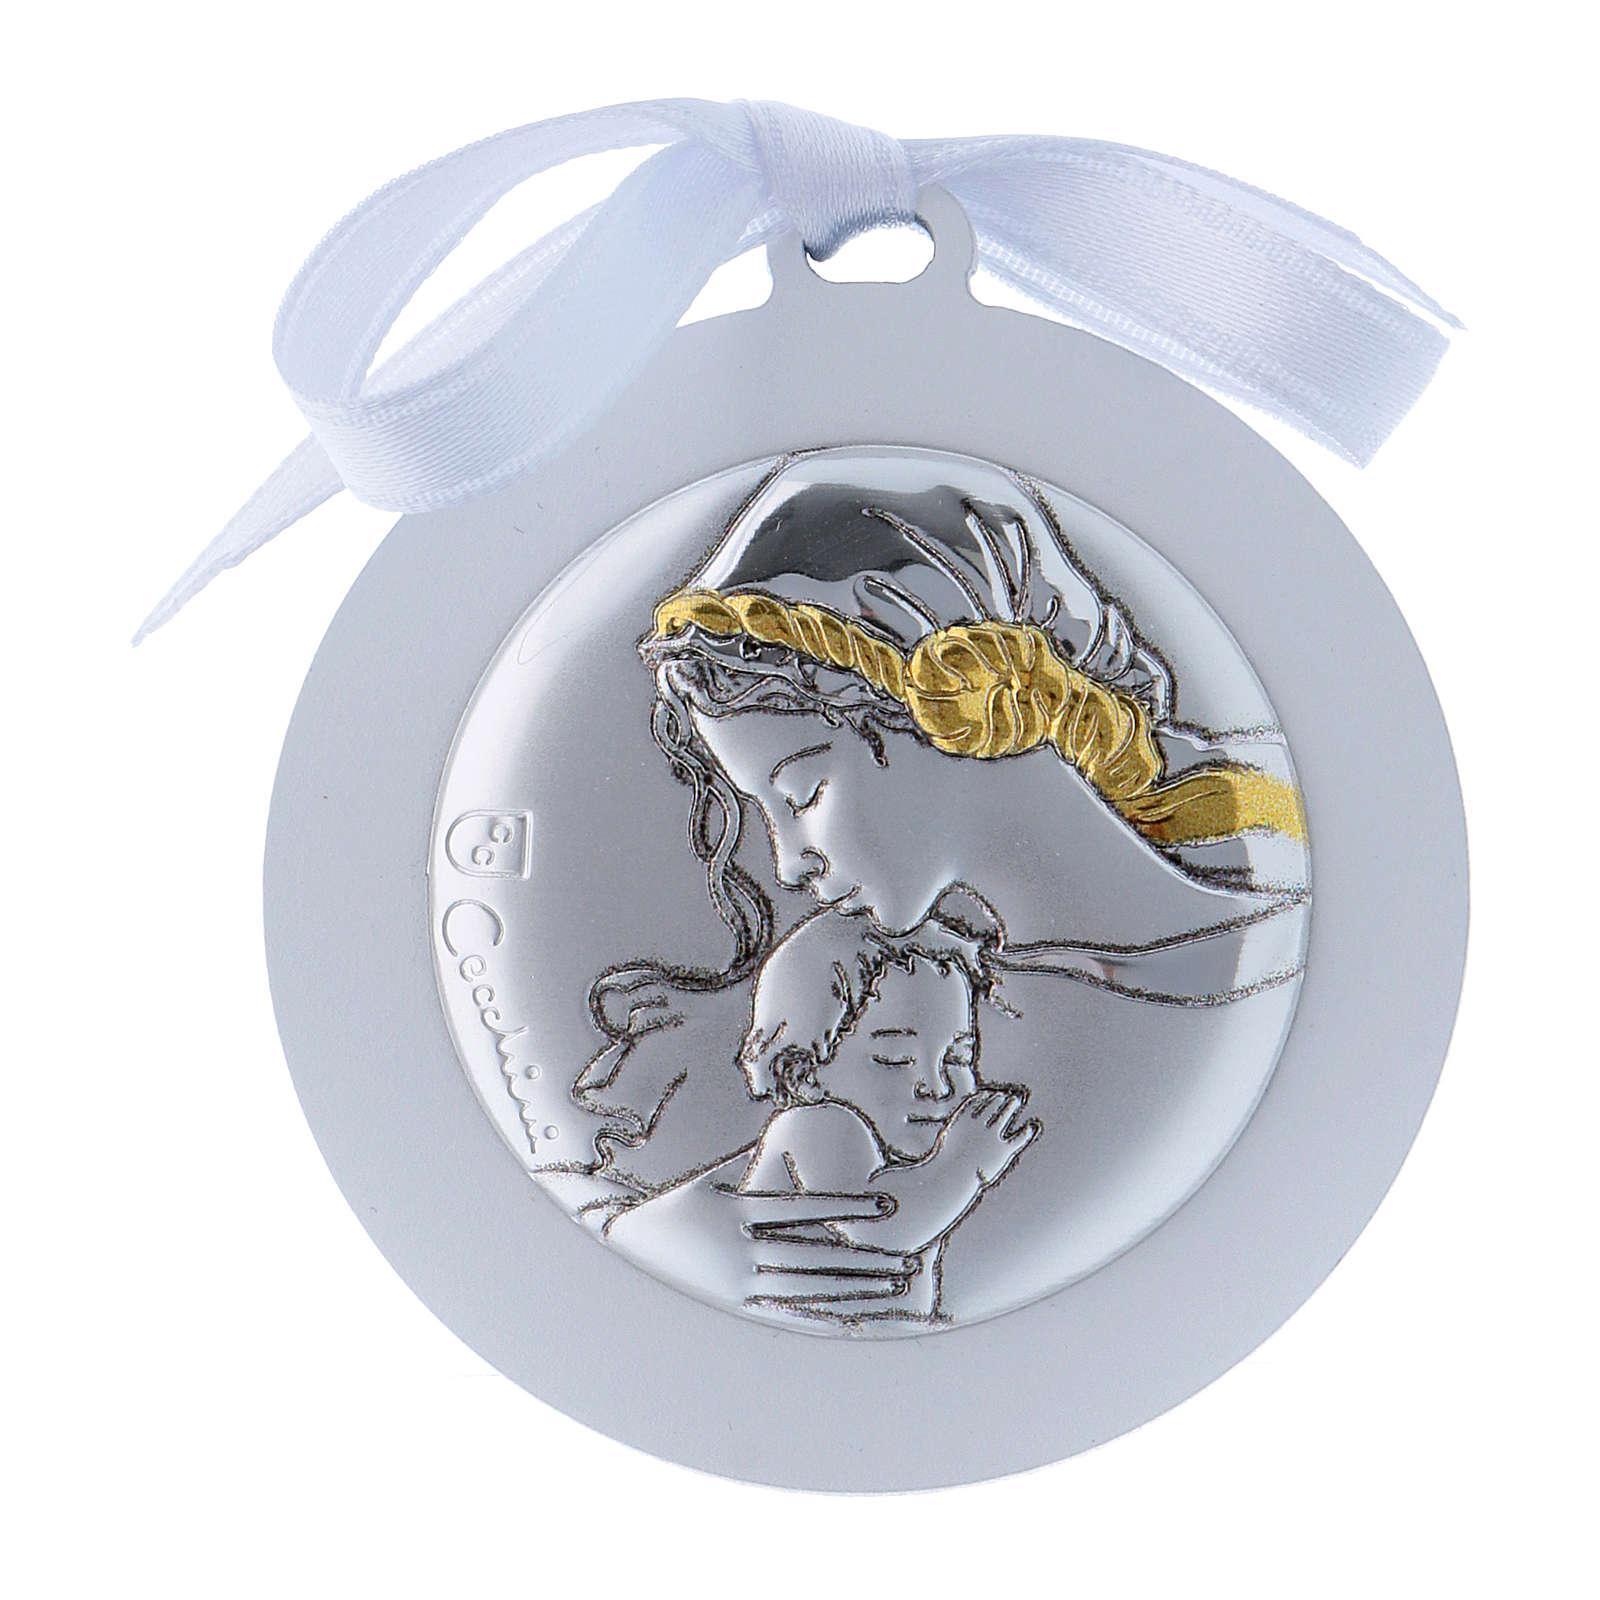 Medalla para cuna cinta blanca Virgen Niño bilaminado detalles oro 4 cm 4